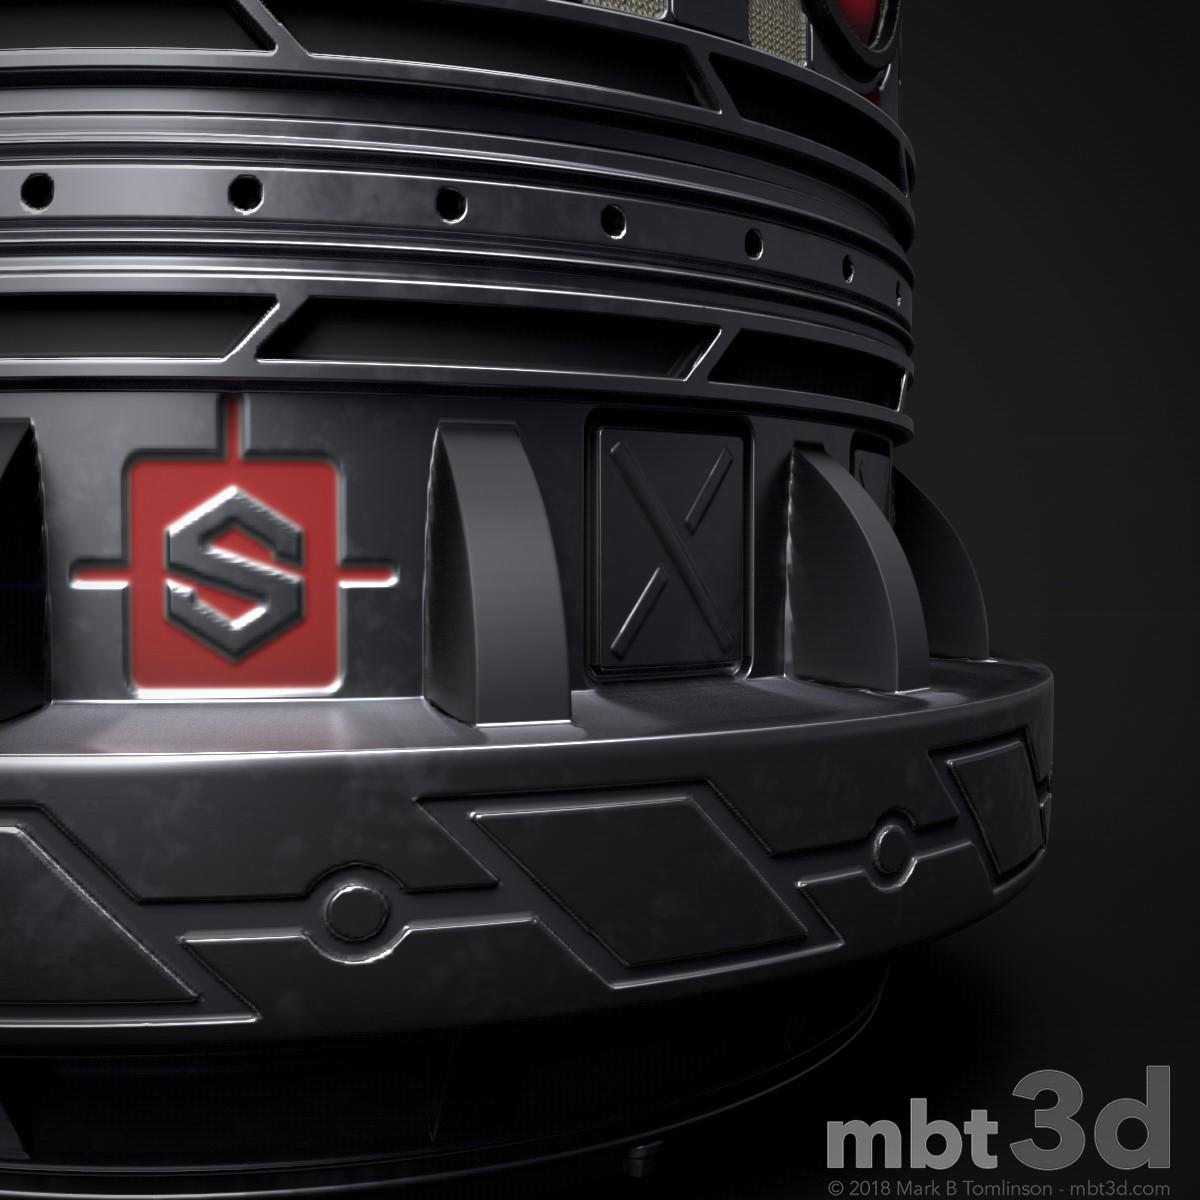 Sci-Fi Capsule - Base